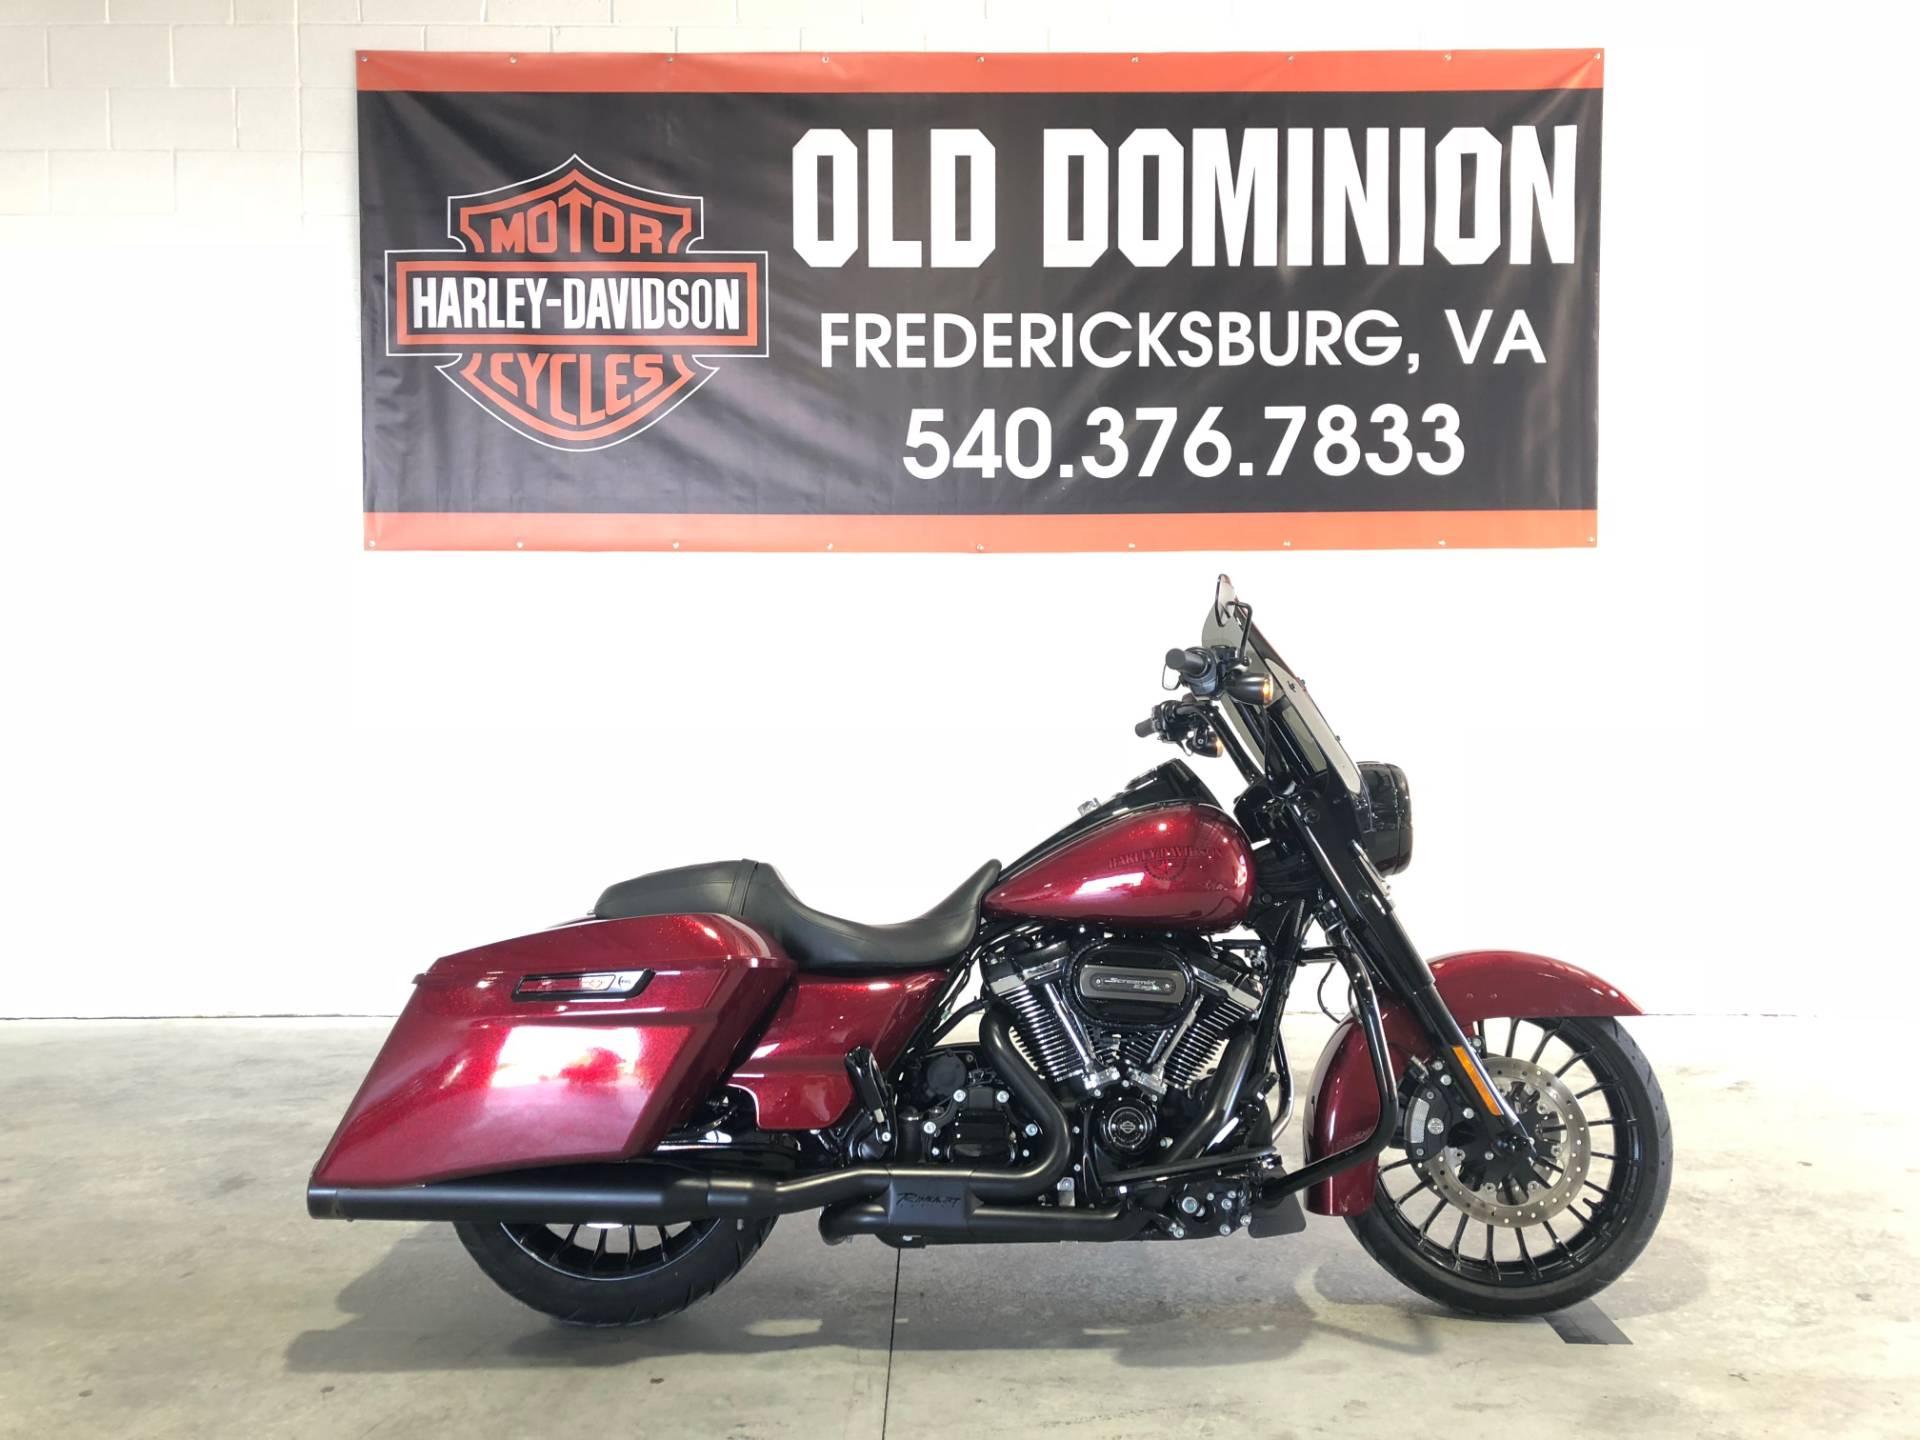 2017 Harley-Davidson Road King® Special in Fredericksburg, Virginia